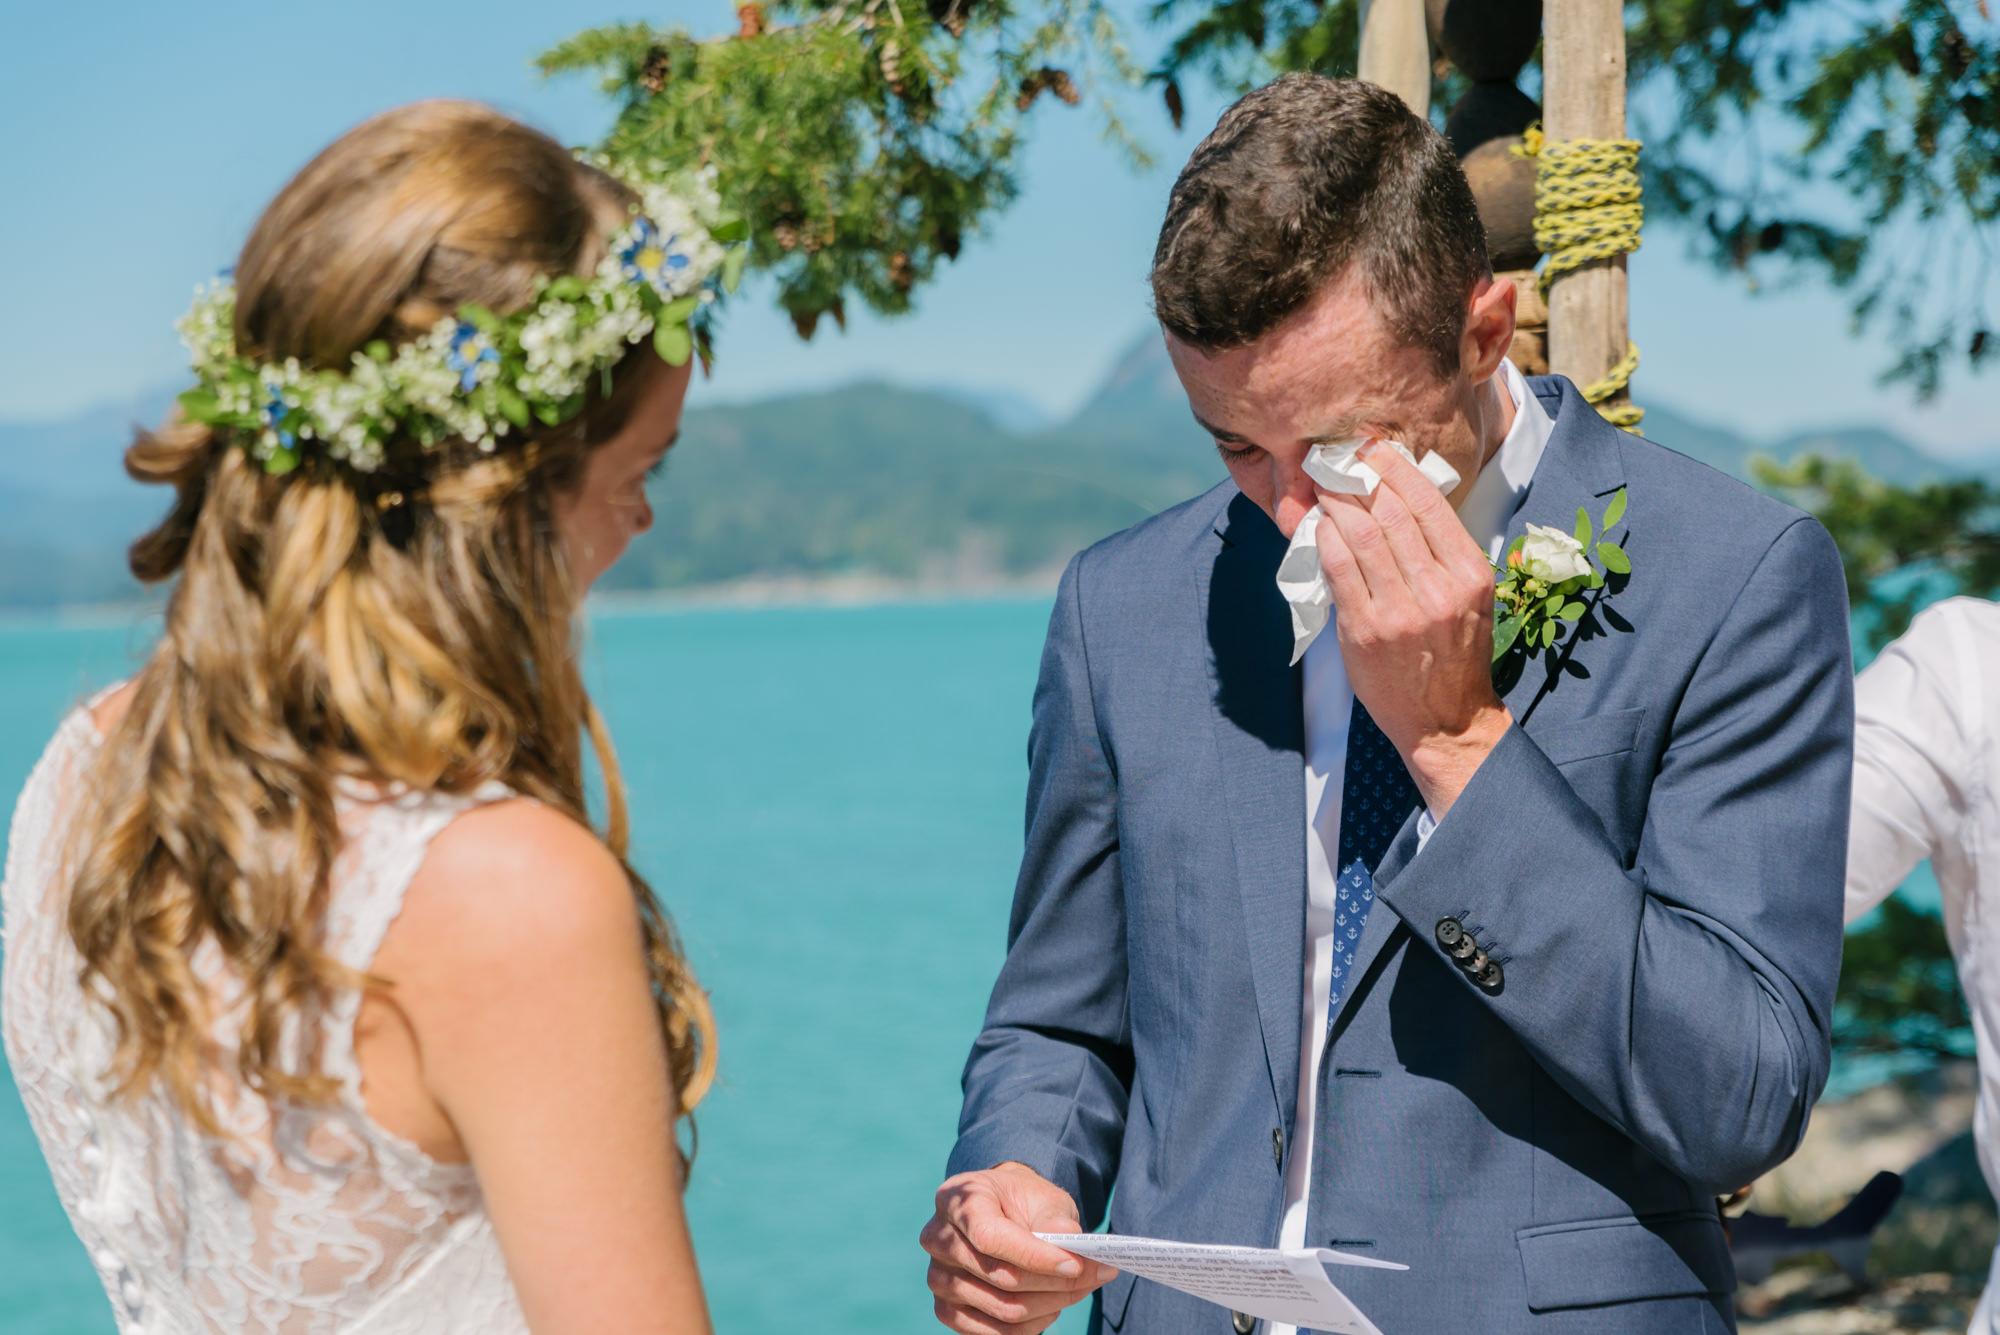 bowen_island_wedding_photographer_vancouver142355_13_ally&james.jpg